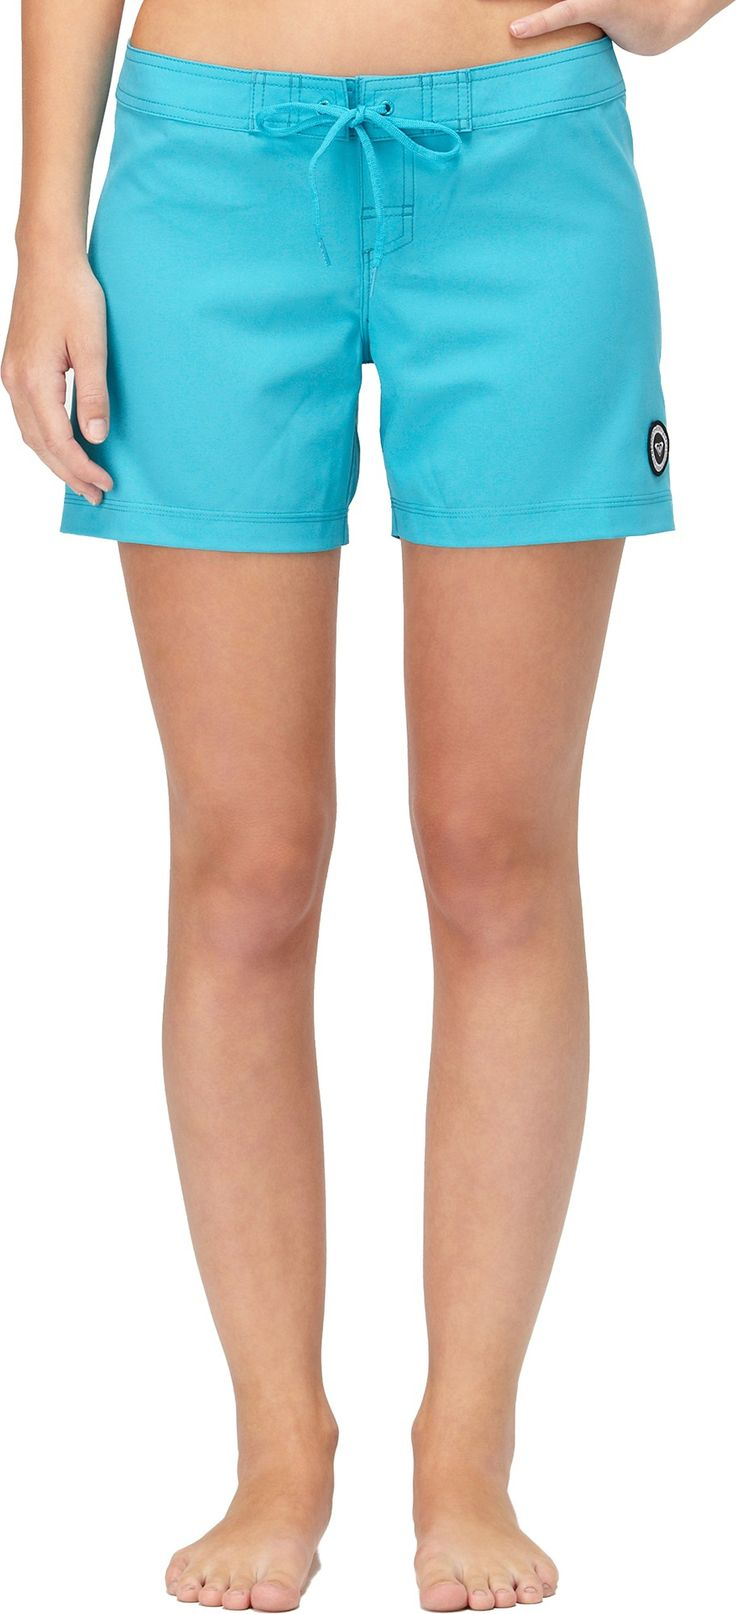 The 25+ Best Swim Shorts Women Ideas On Pinterest | Bathing Suit Shorts Swimming Outfit Shorts ...